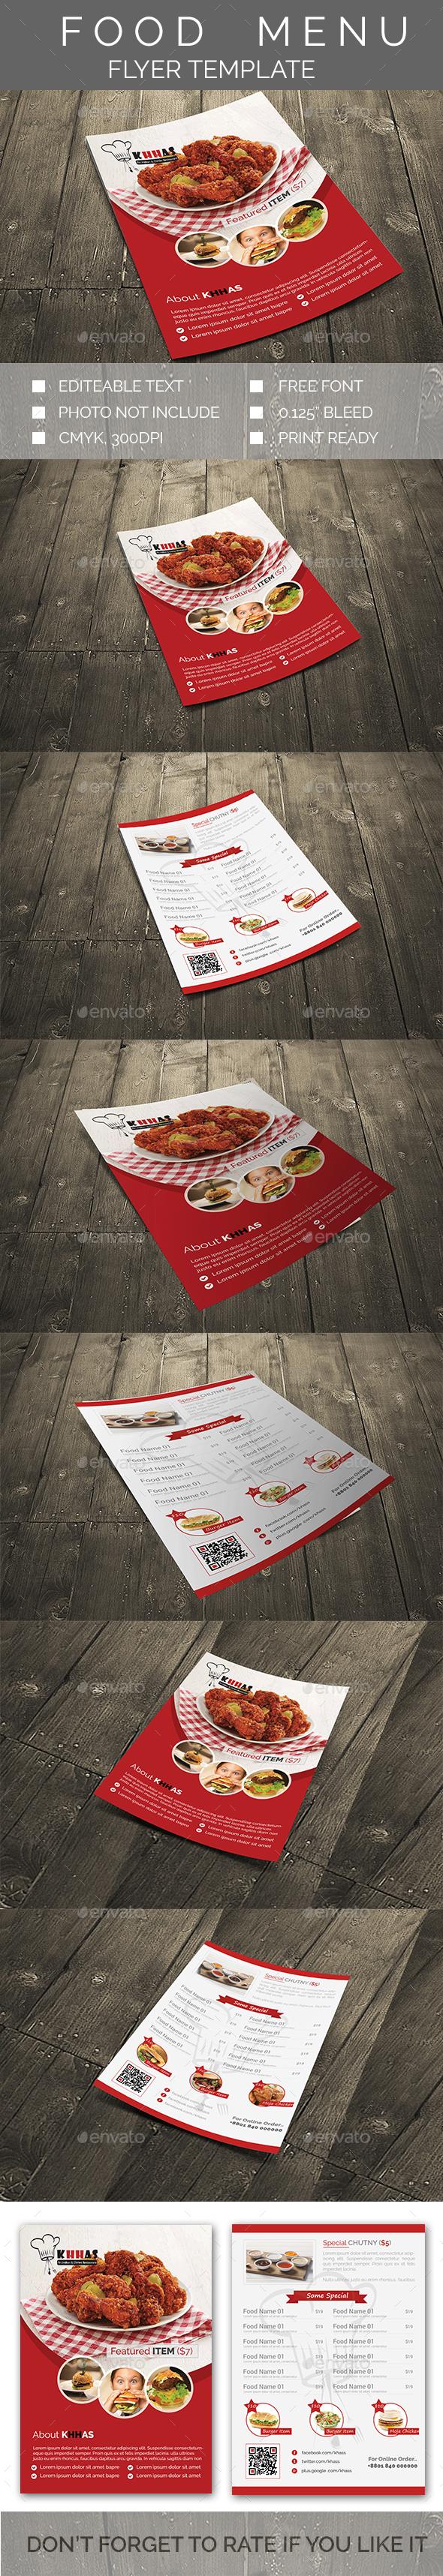 FOOD MENU FLYER TEMPLATE - Restaurant Flyers